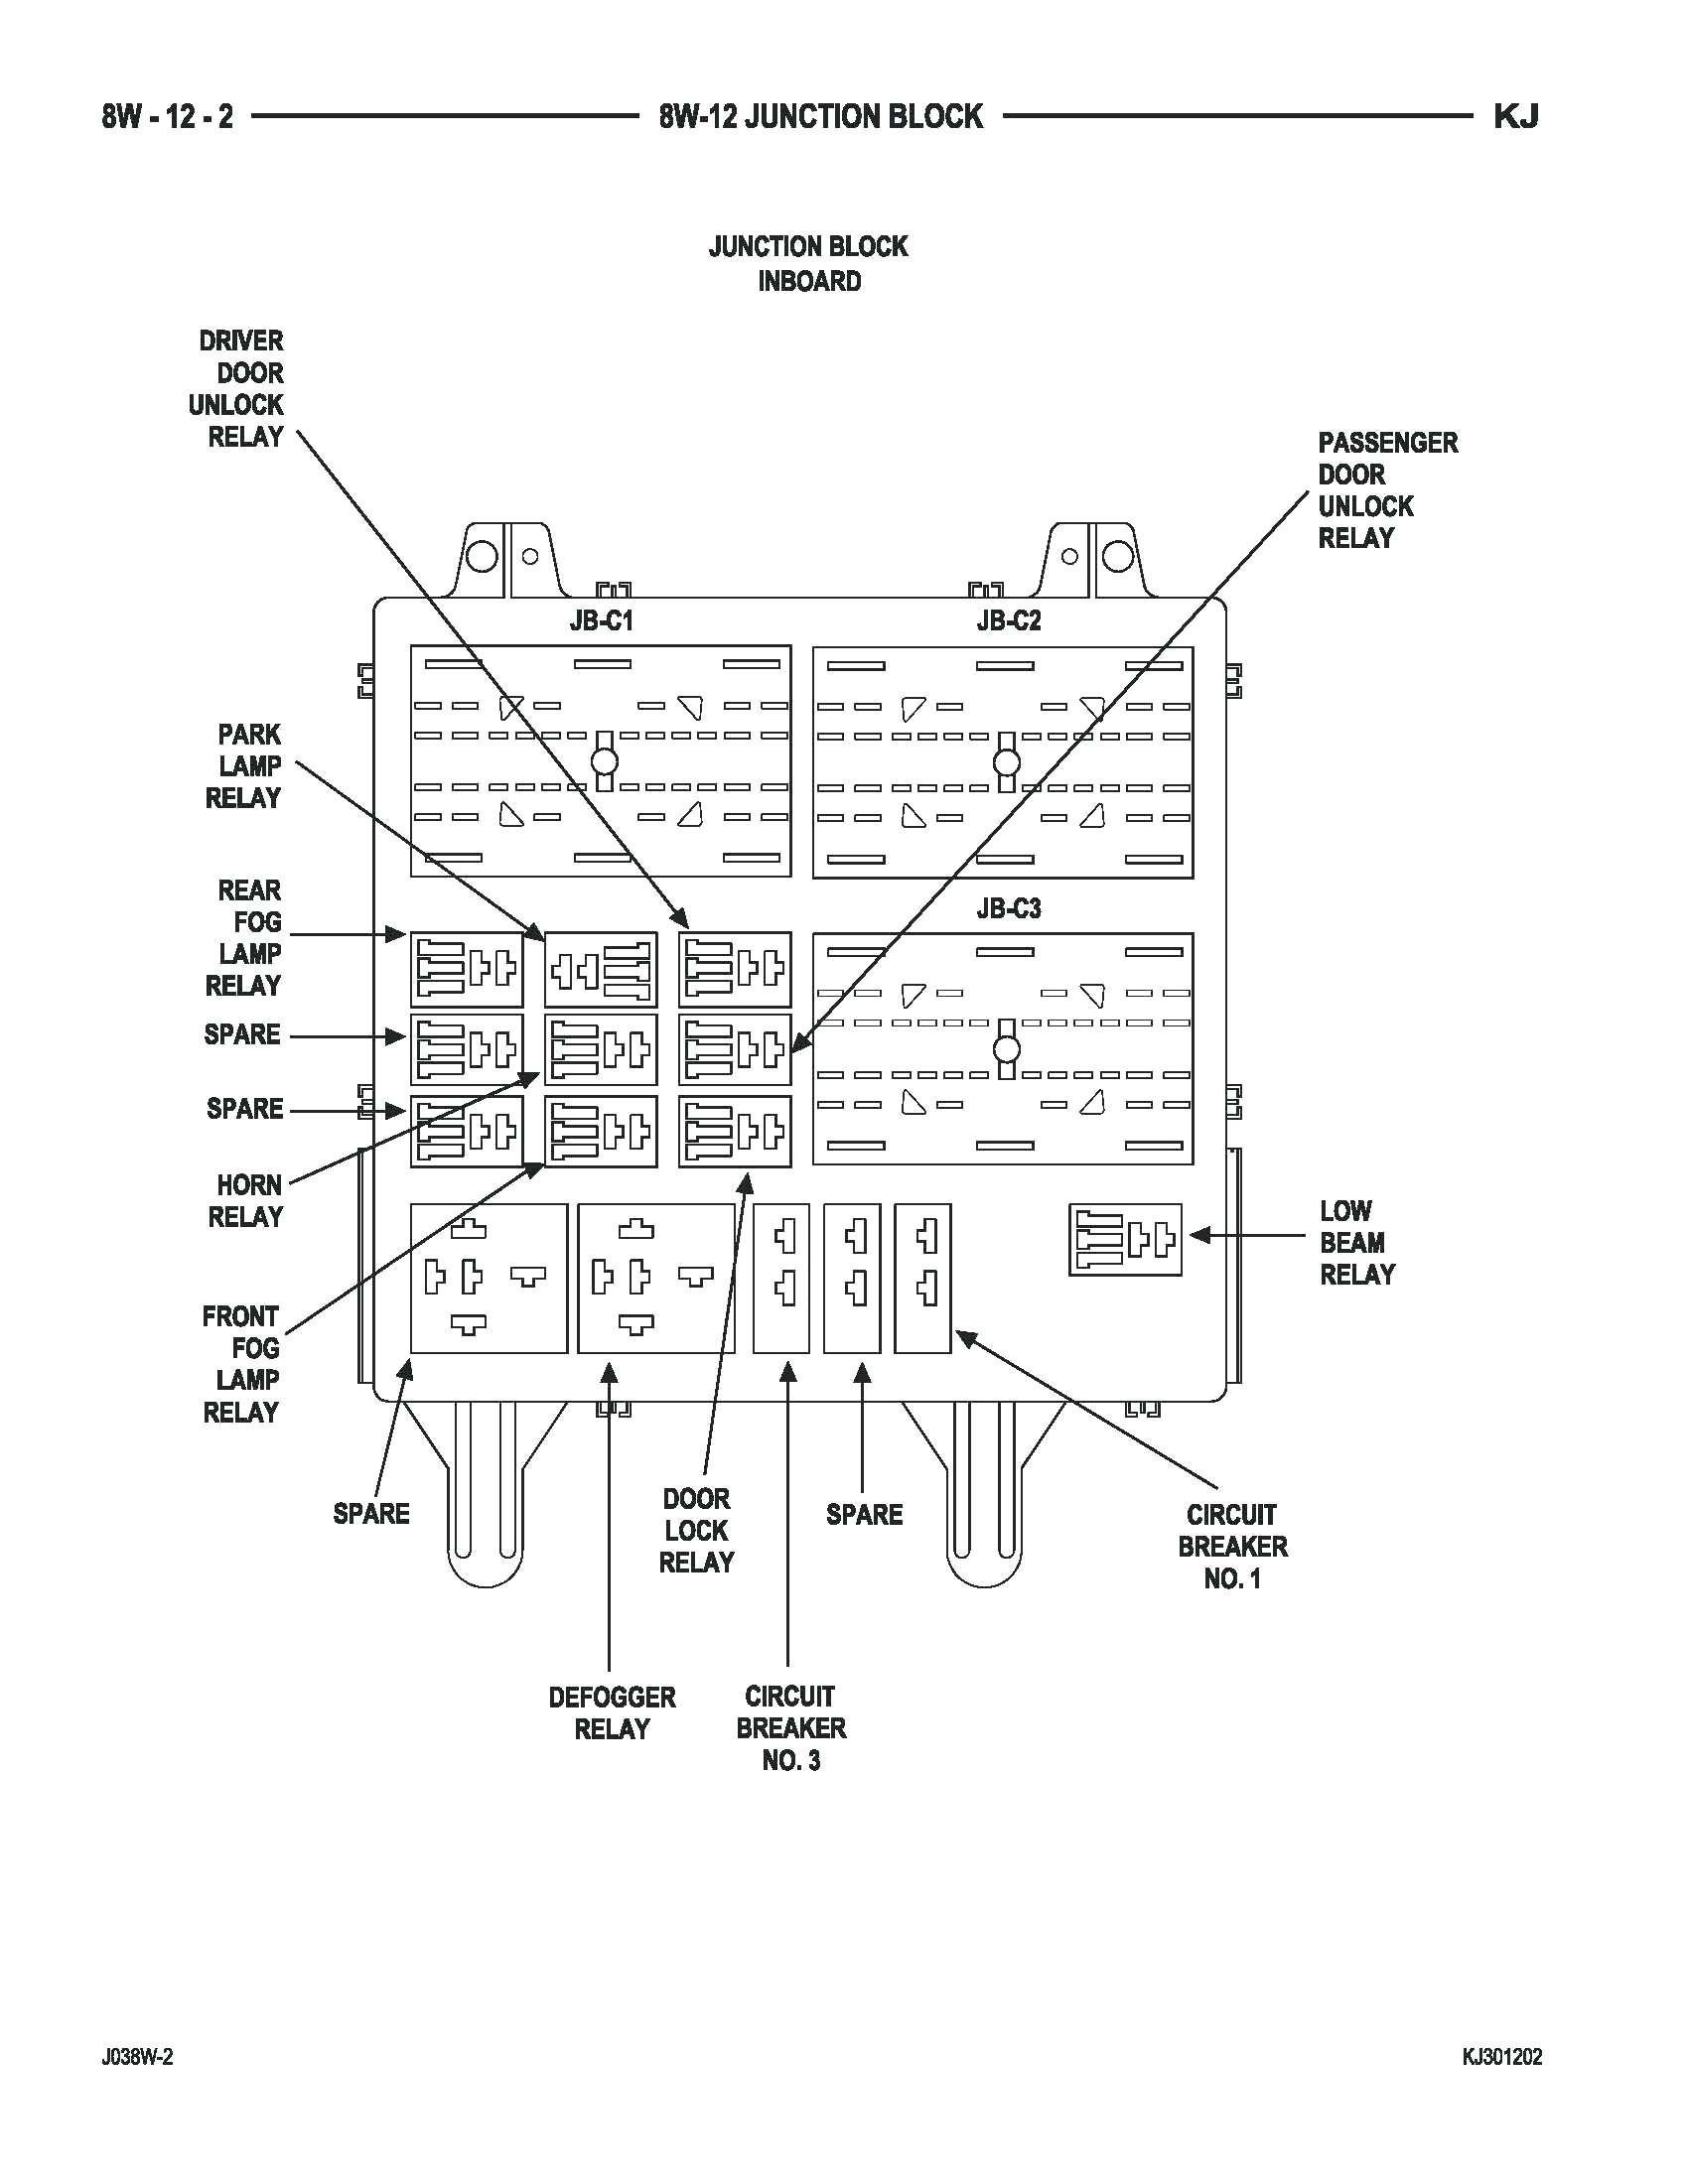 Power Window Diagram Wiring Diagram Brake Controller – Ipphil Of Power Window Diagram